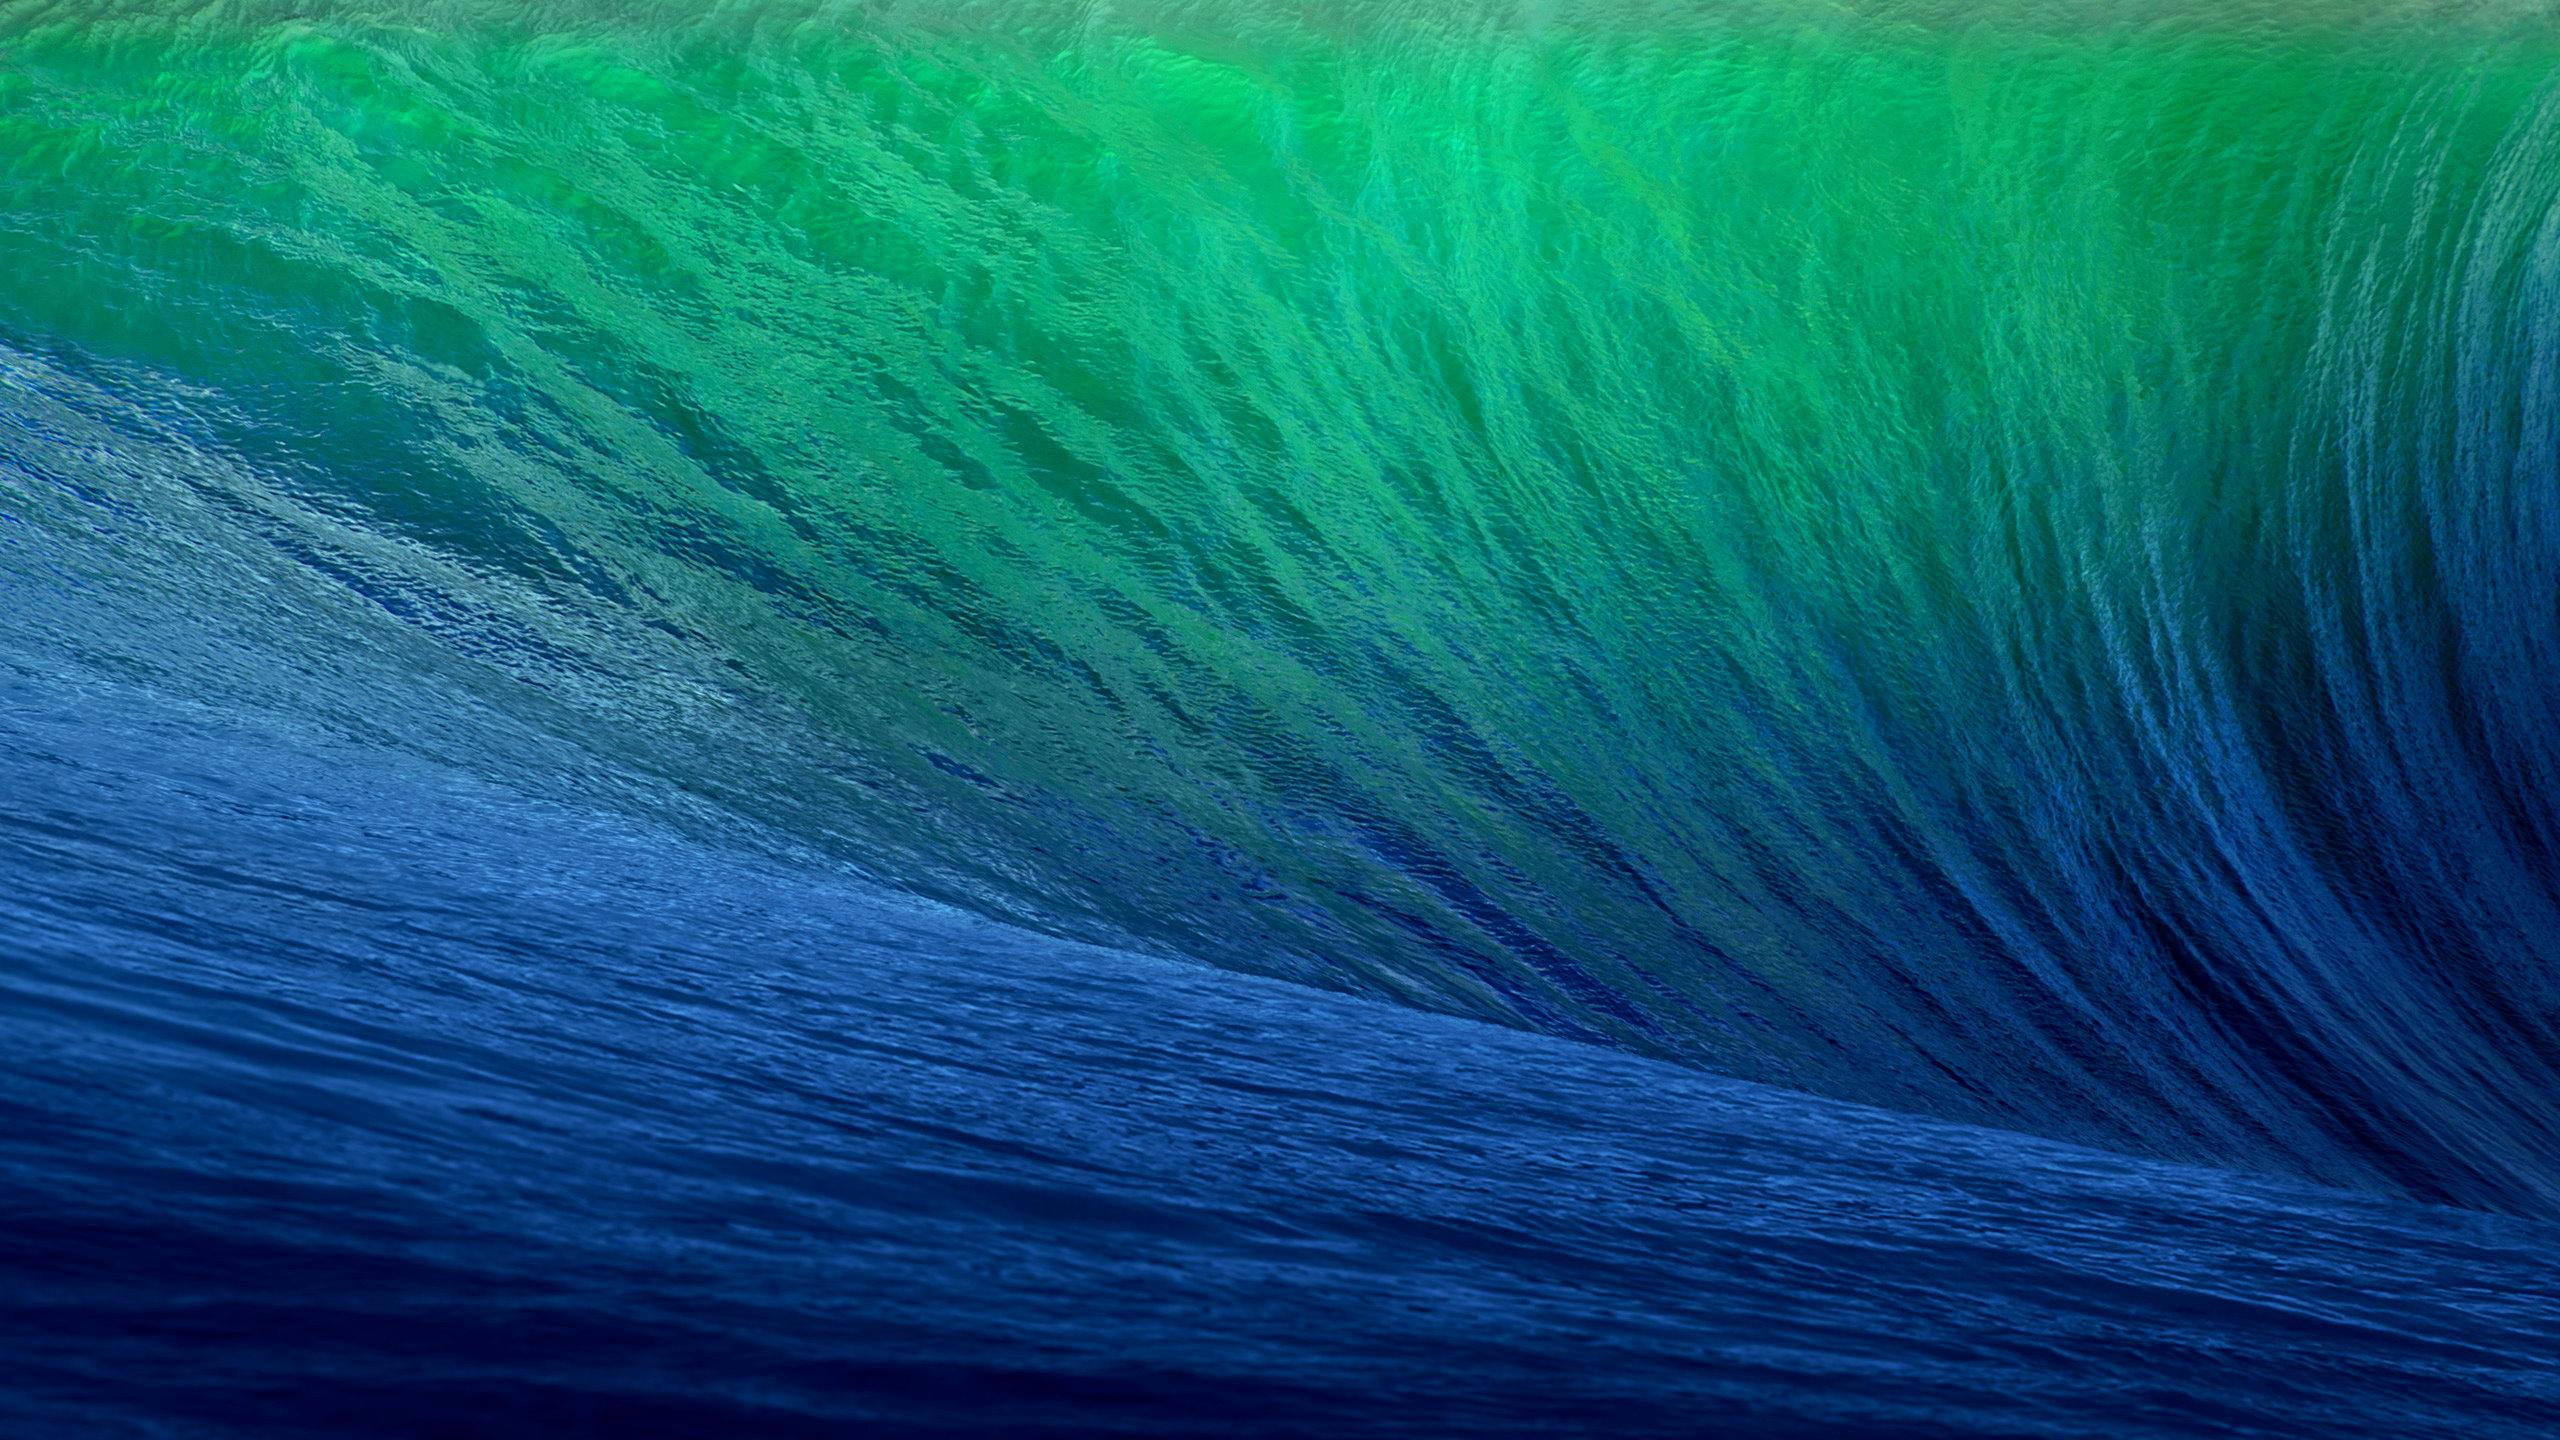 IOS 7 Ocean Hd Wallpaper 2560x1440 pixel Hd Wallpaper 2560x1440